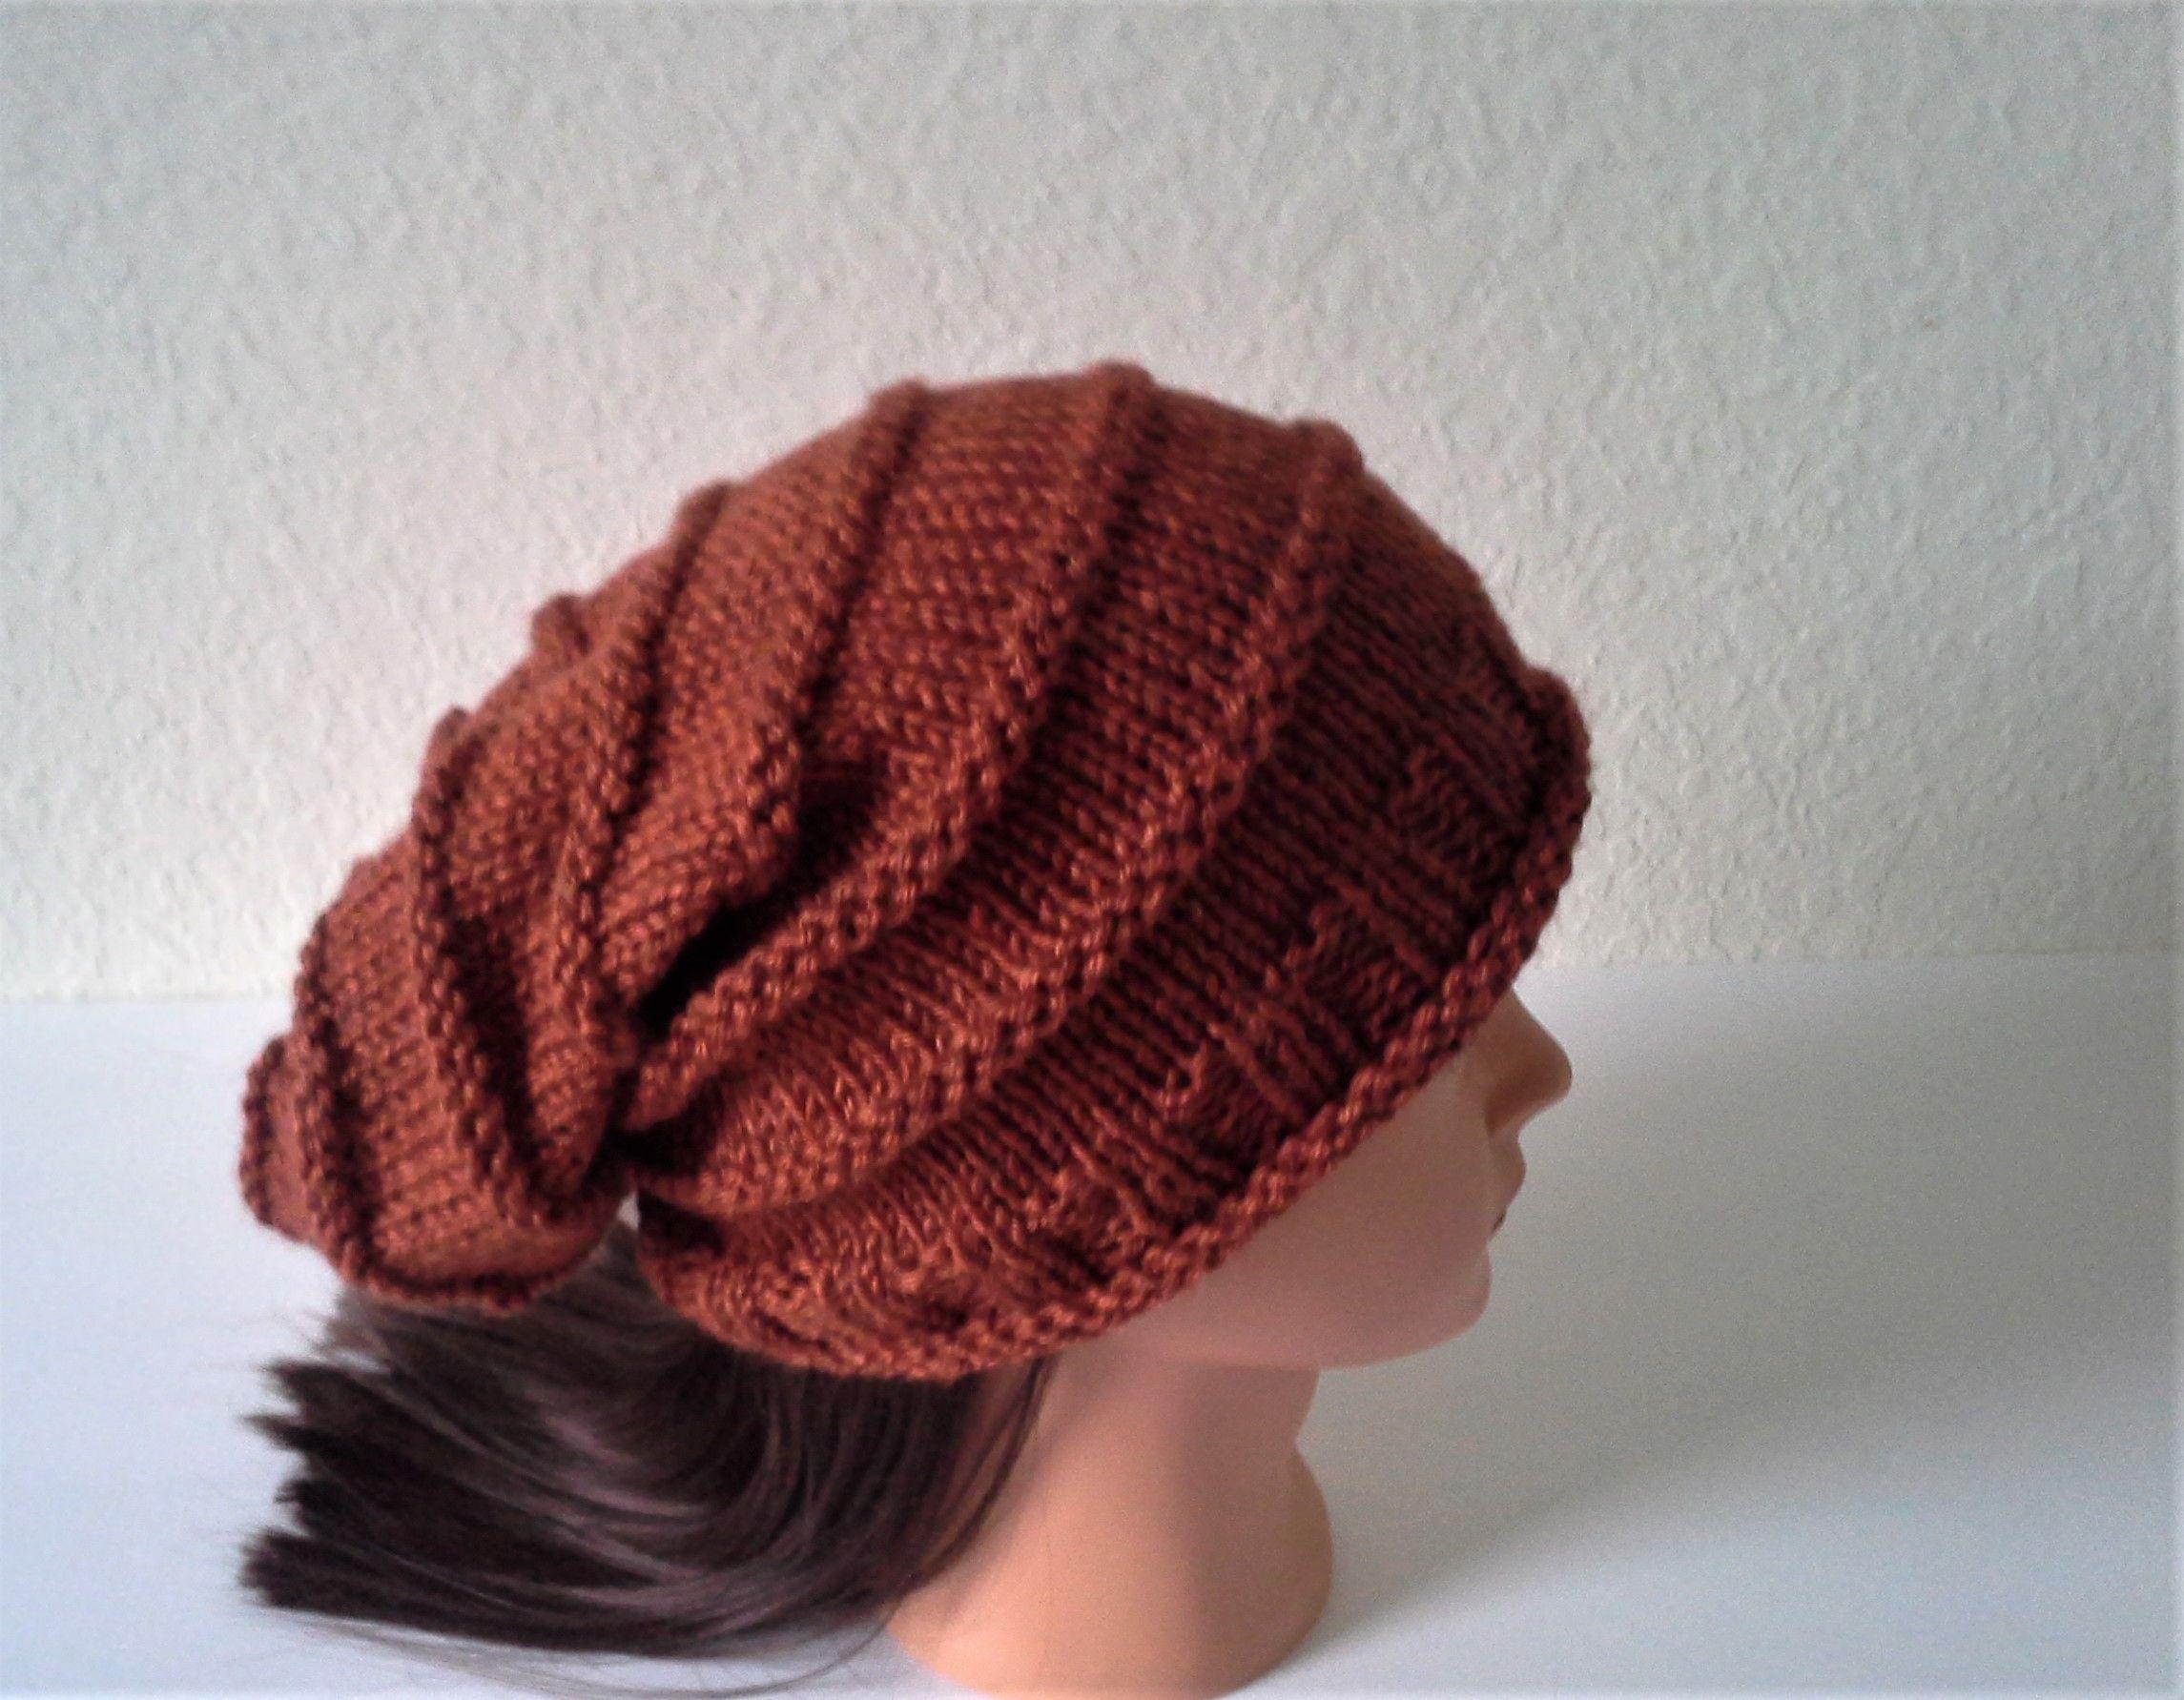 49bcd573234a2 Women s Slouchy Beanie Knit